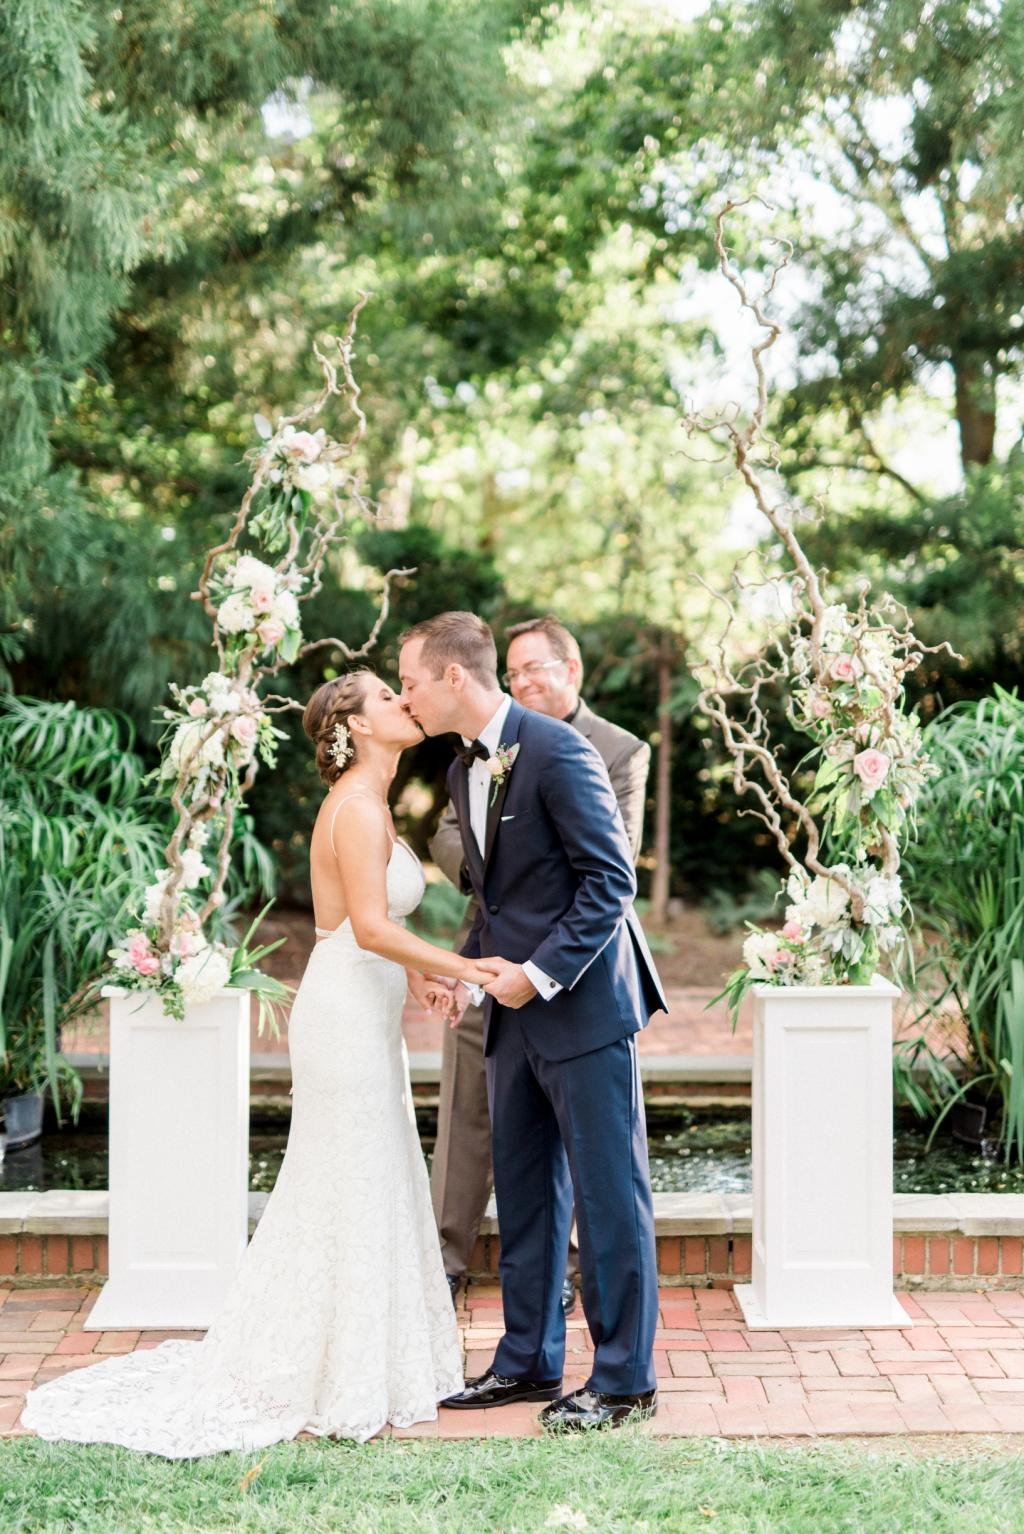 haley-richter-photography-buena-vista-confrence-center-wedding-summer-136